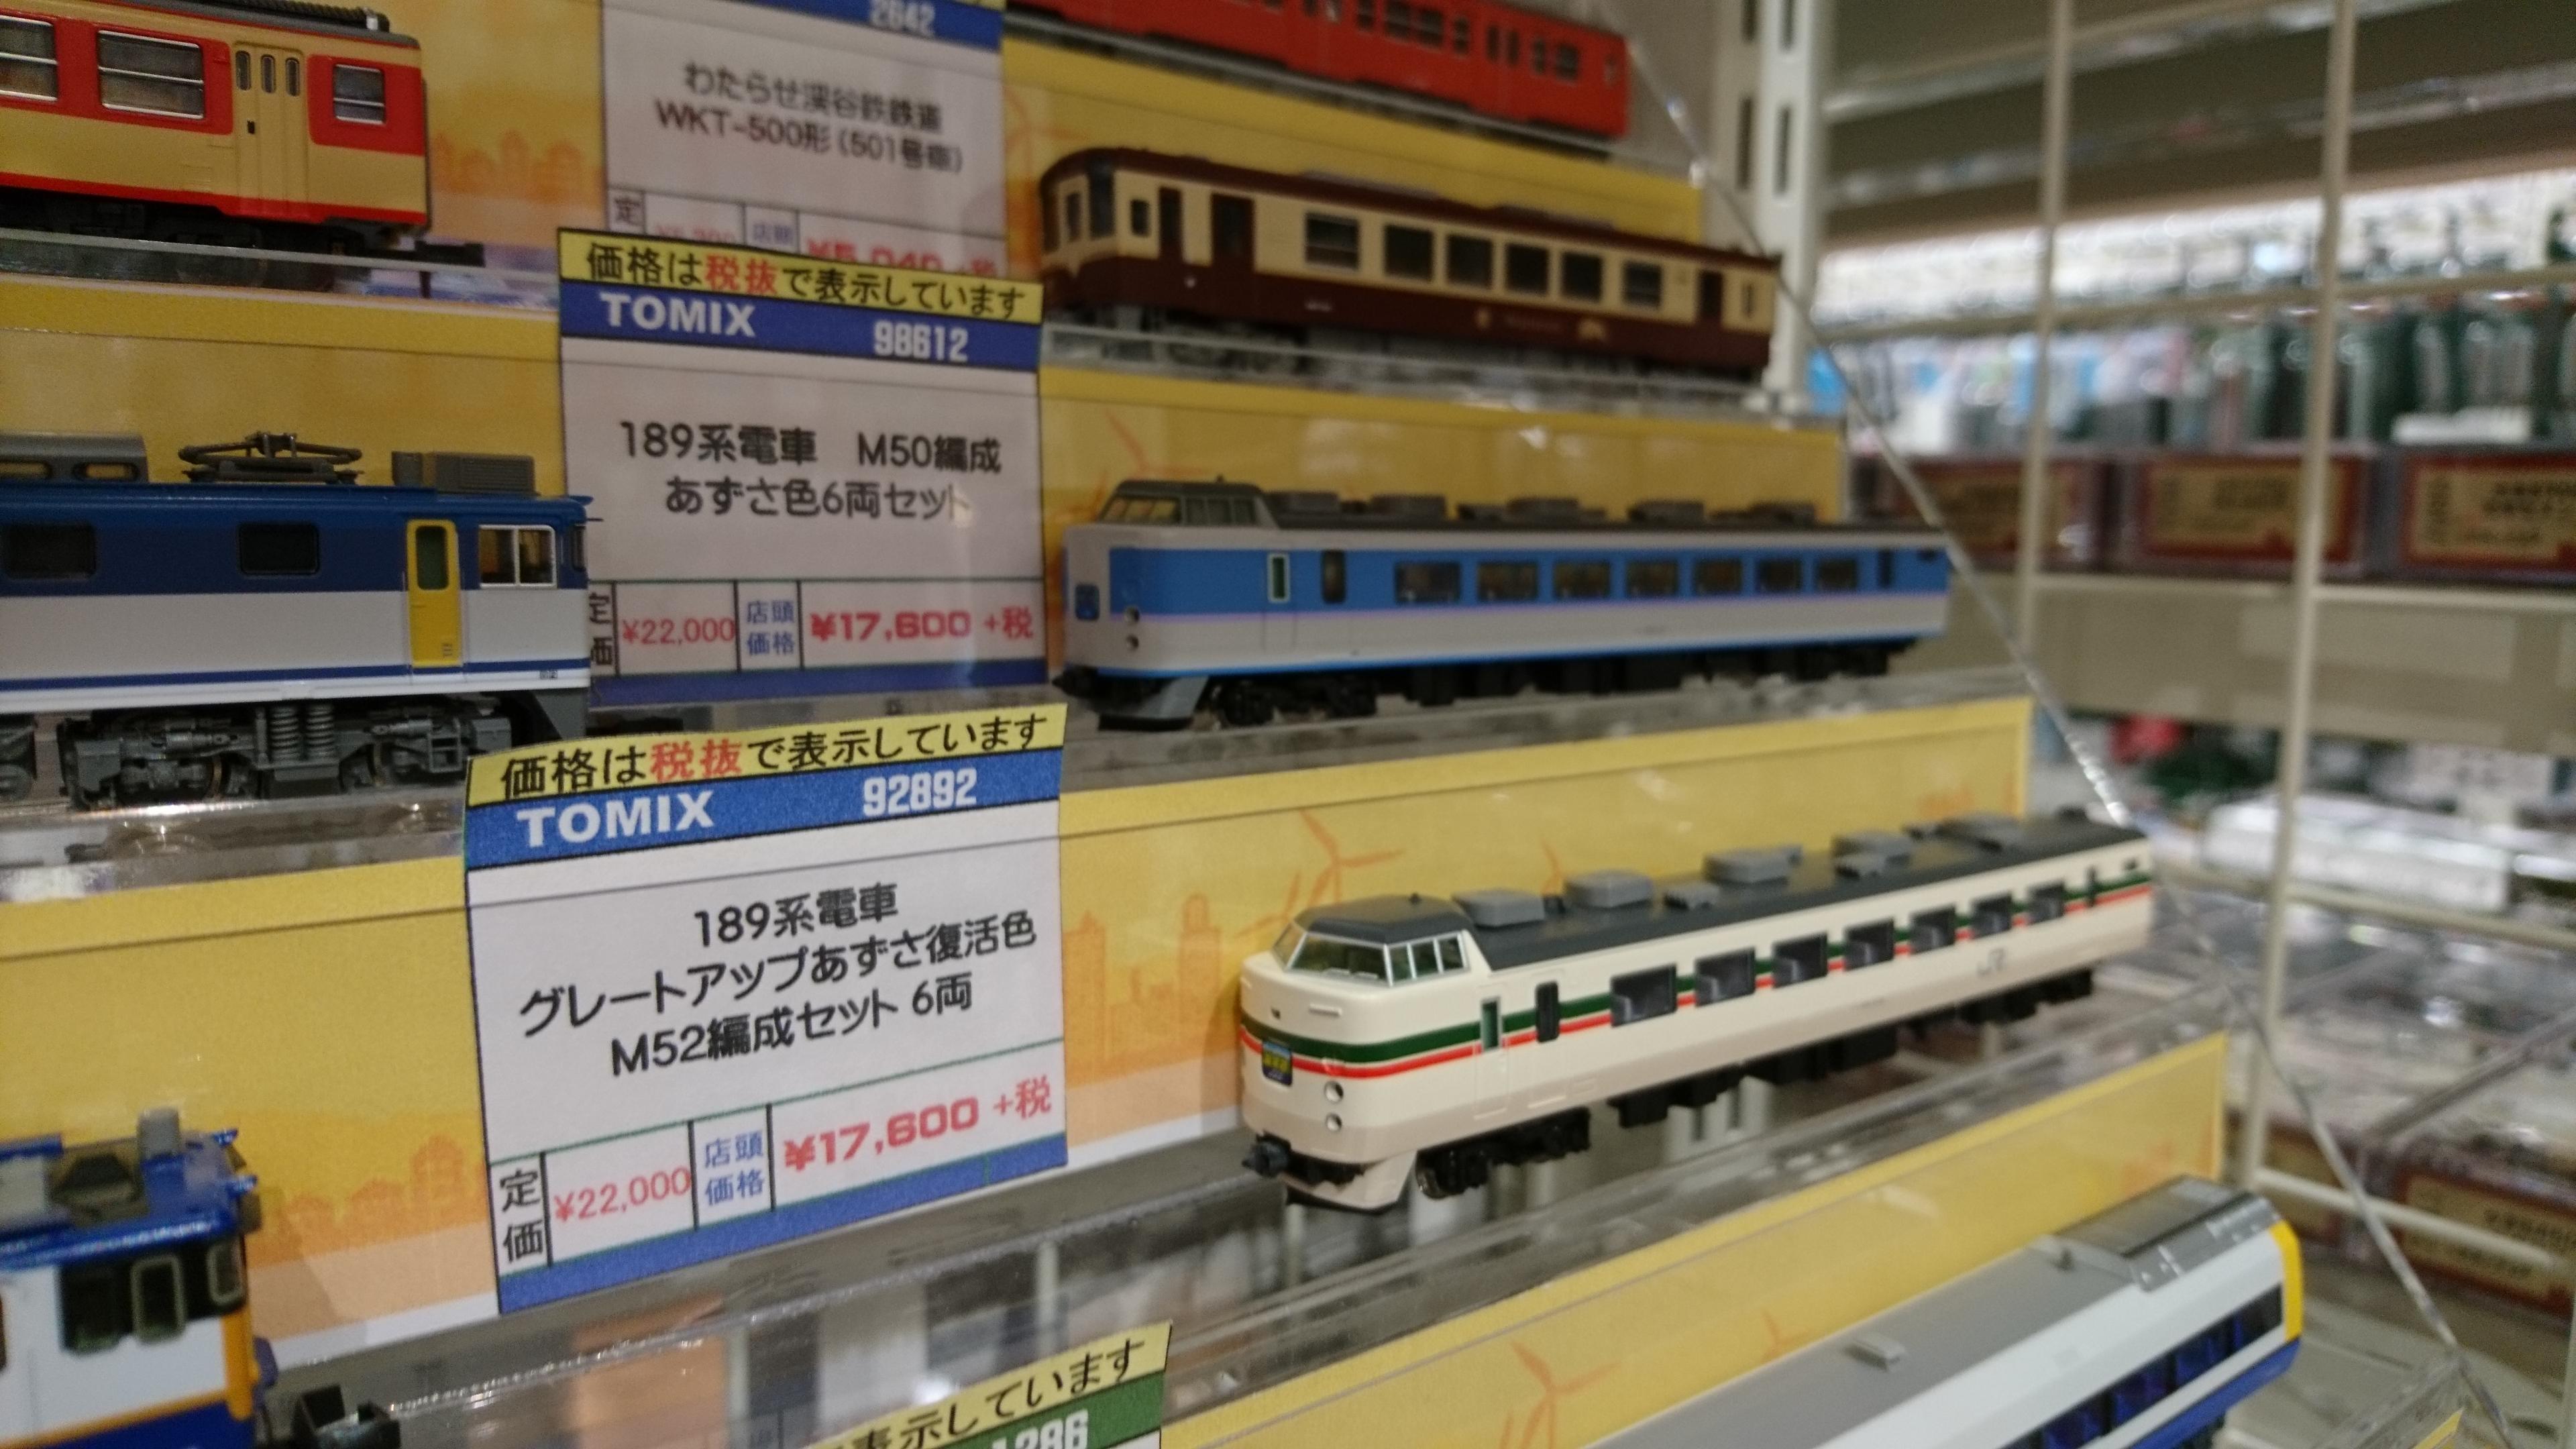 http://popondetta.com/blog_hiroshimafutyu/183M50M52.JPG